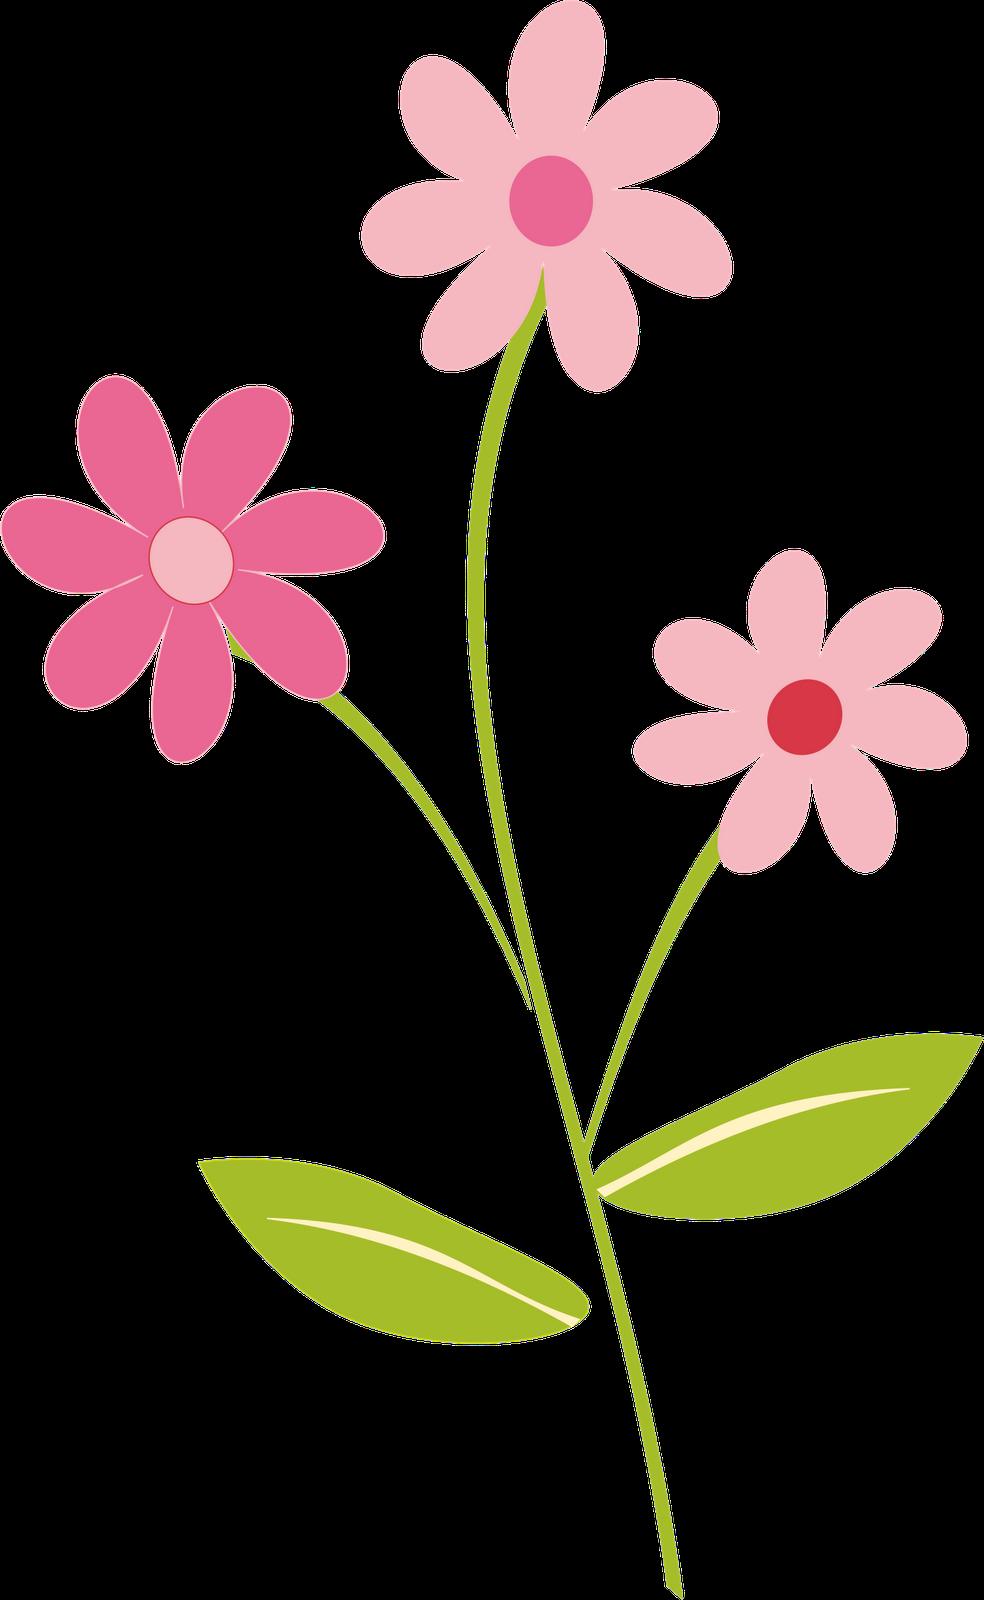 984x1600 Flowers Clip Art Border Png